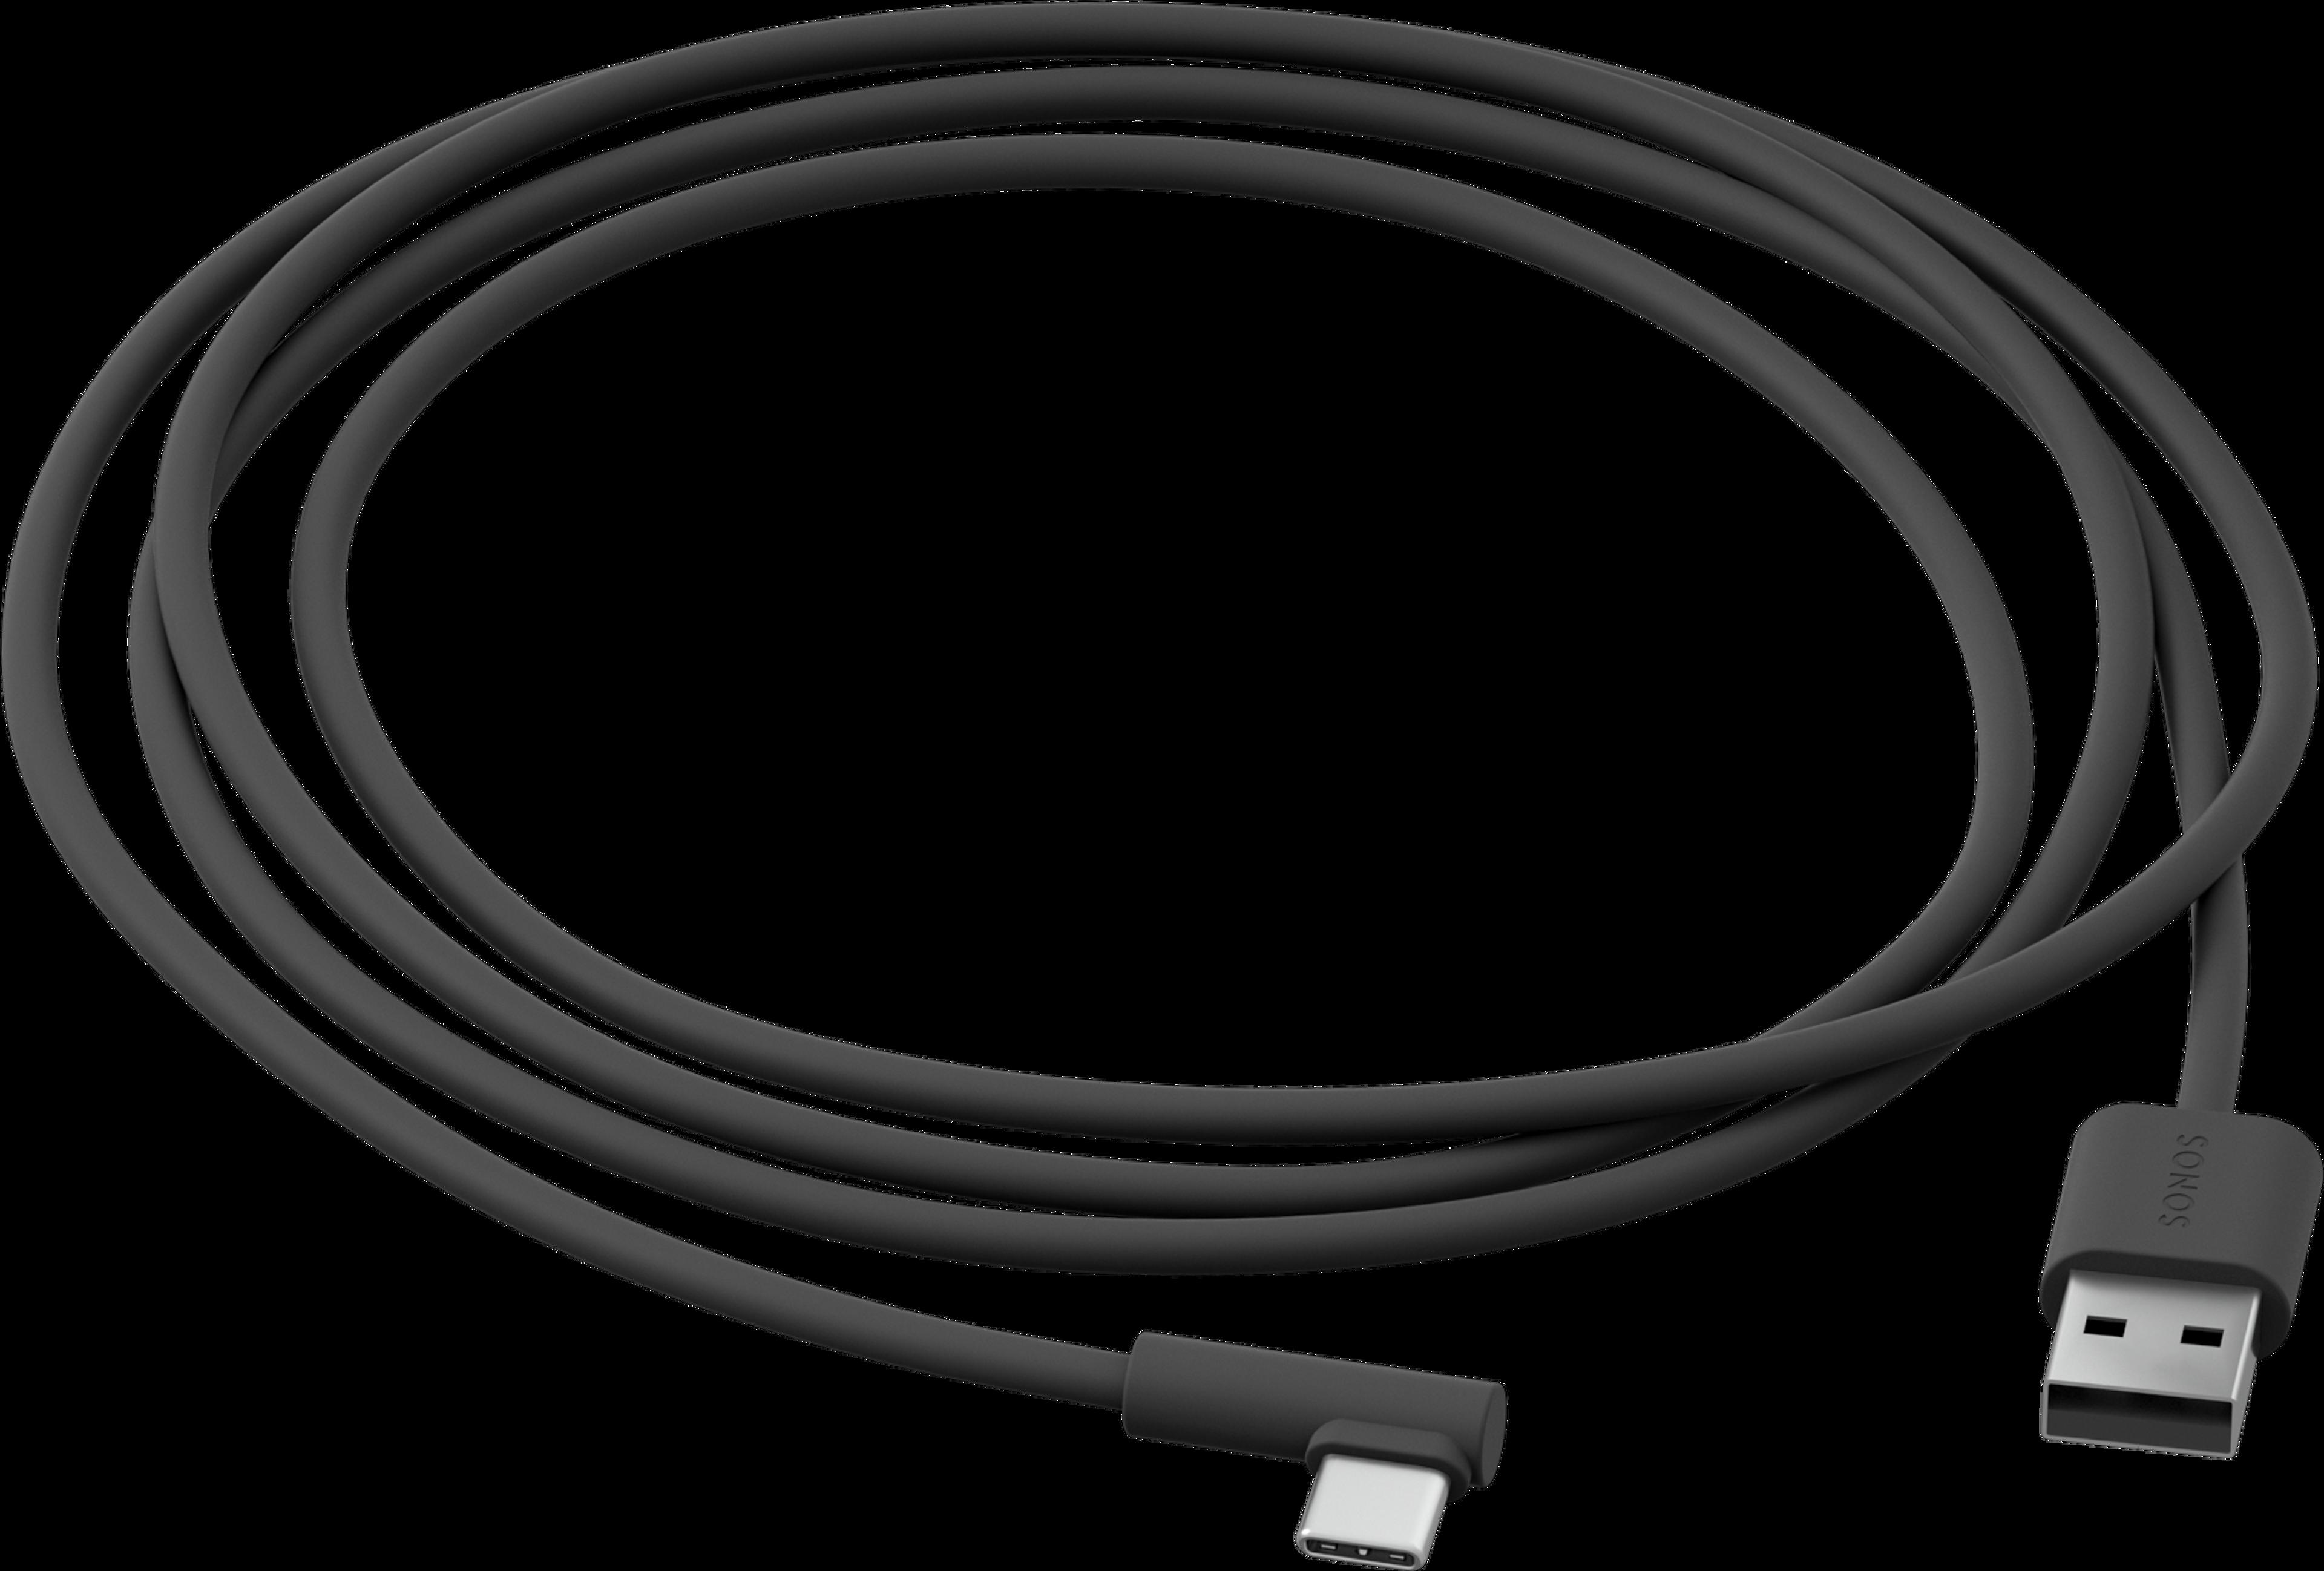 Roam USB A-C Charging Cable shadow black